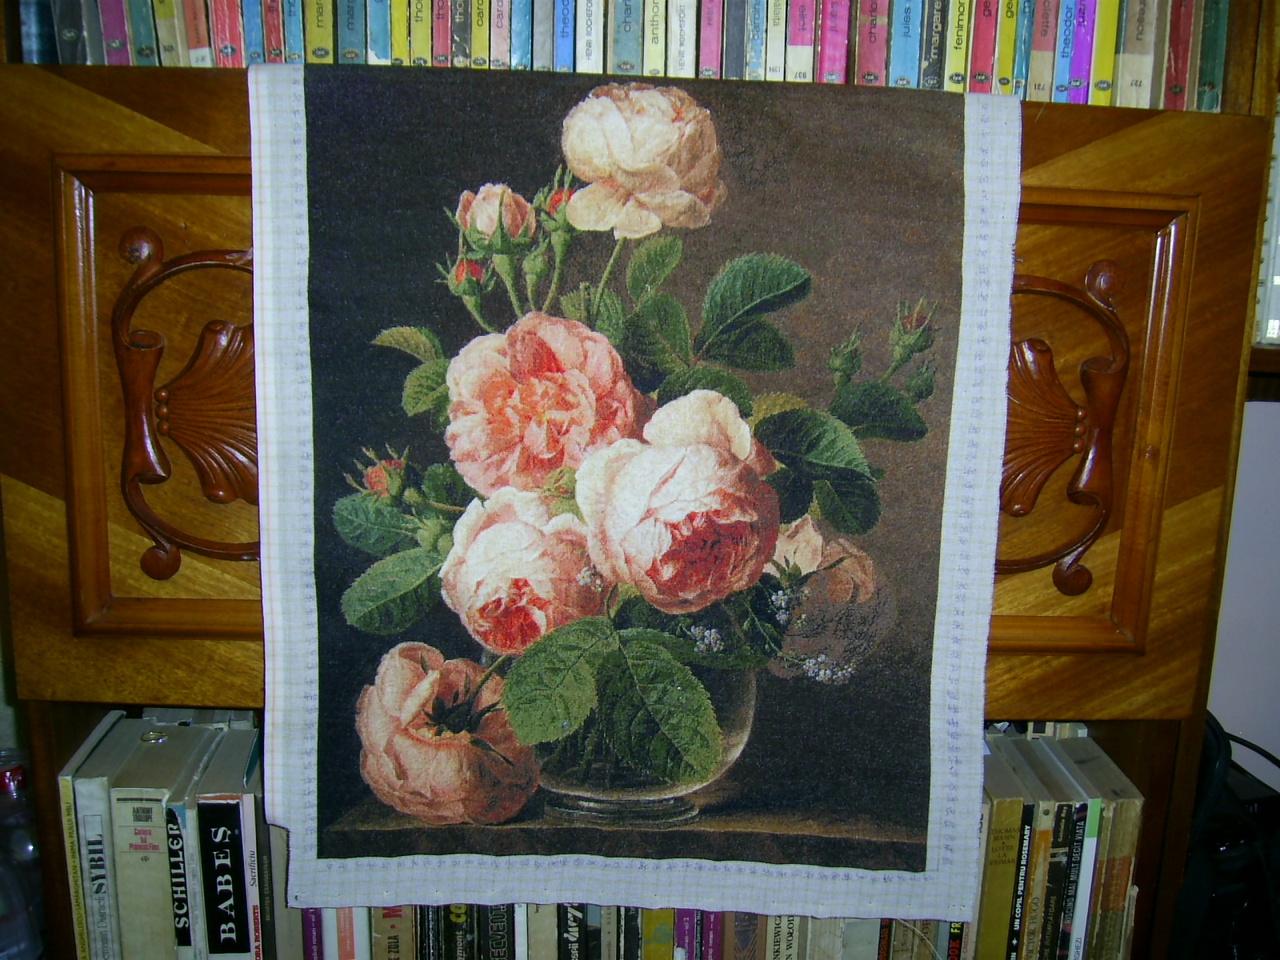 Anasstasia - goblen galerie - Pagina 20 PIC_0005